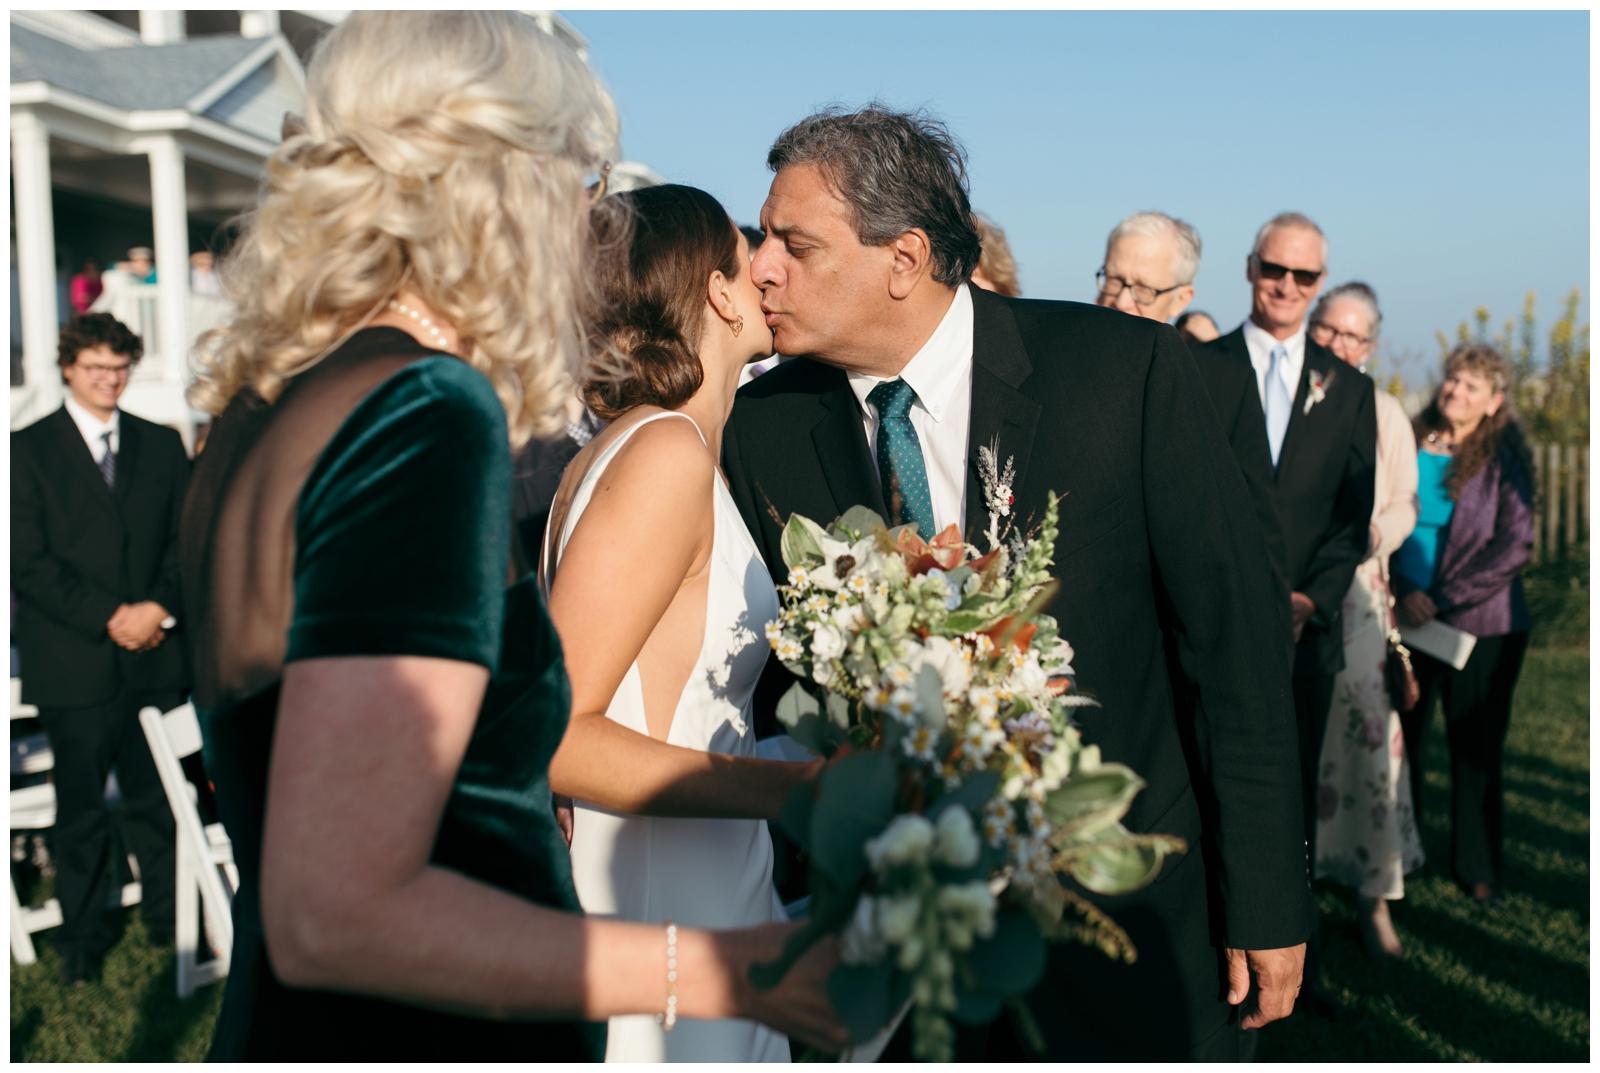 Madison-Beach-Hotel-Wedding-Bailey-Q-Photo-Boston-Wedding-Photographer-030.jpg